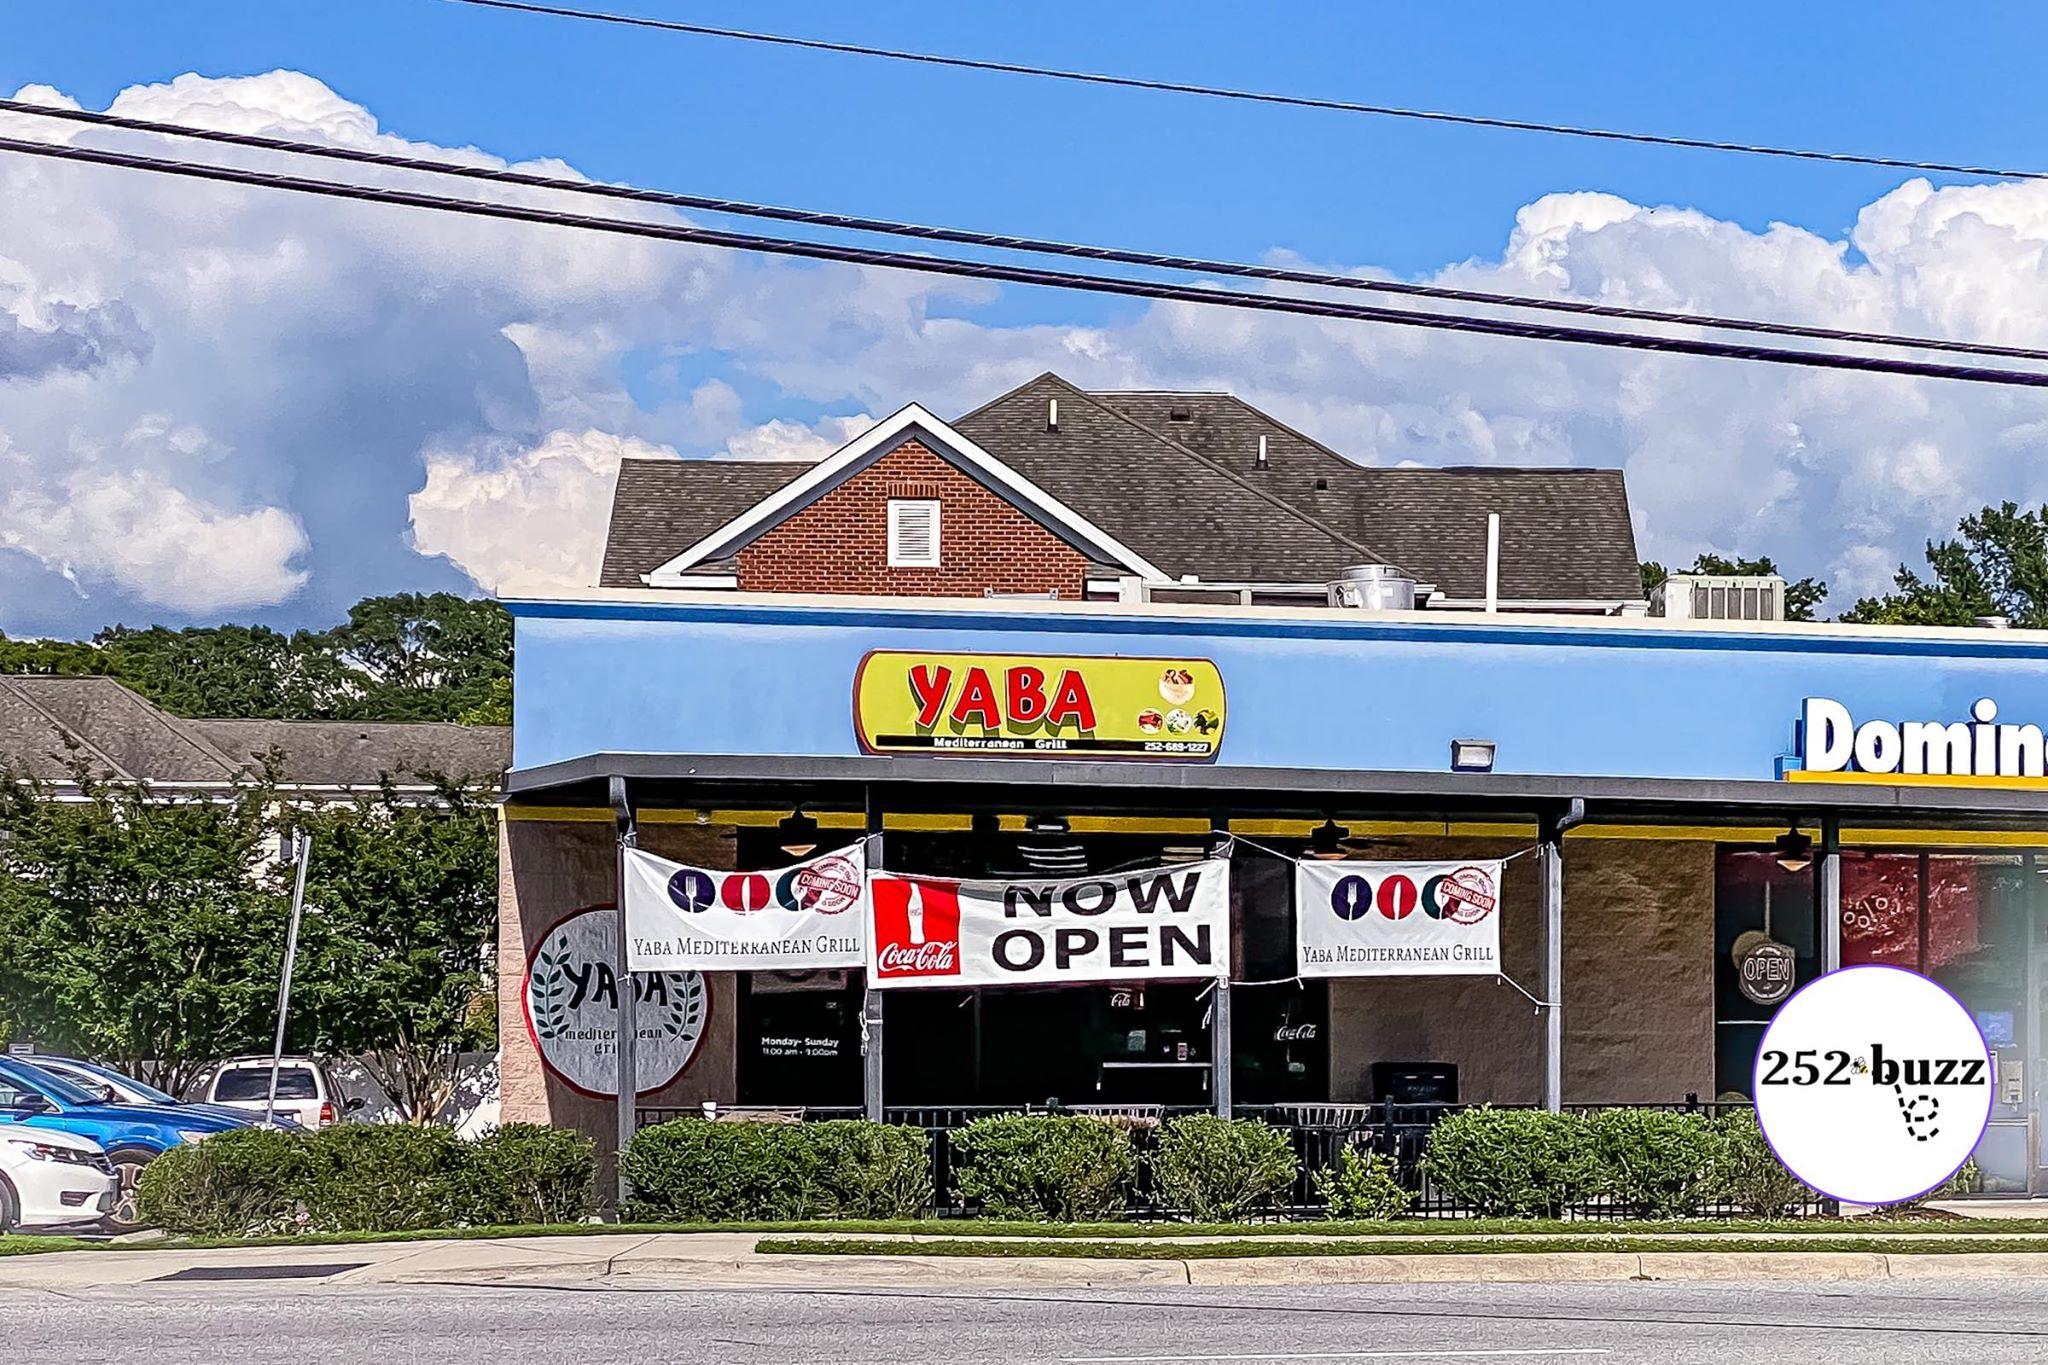 Greenville's YABA Mediterranean Grill